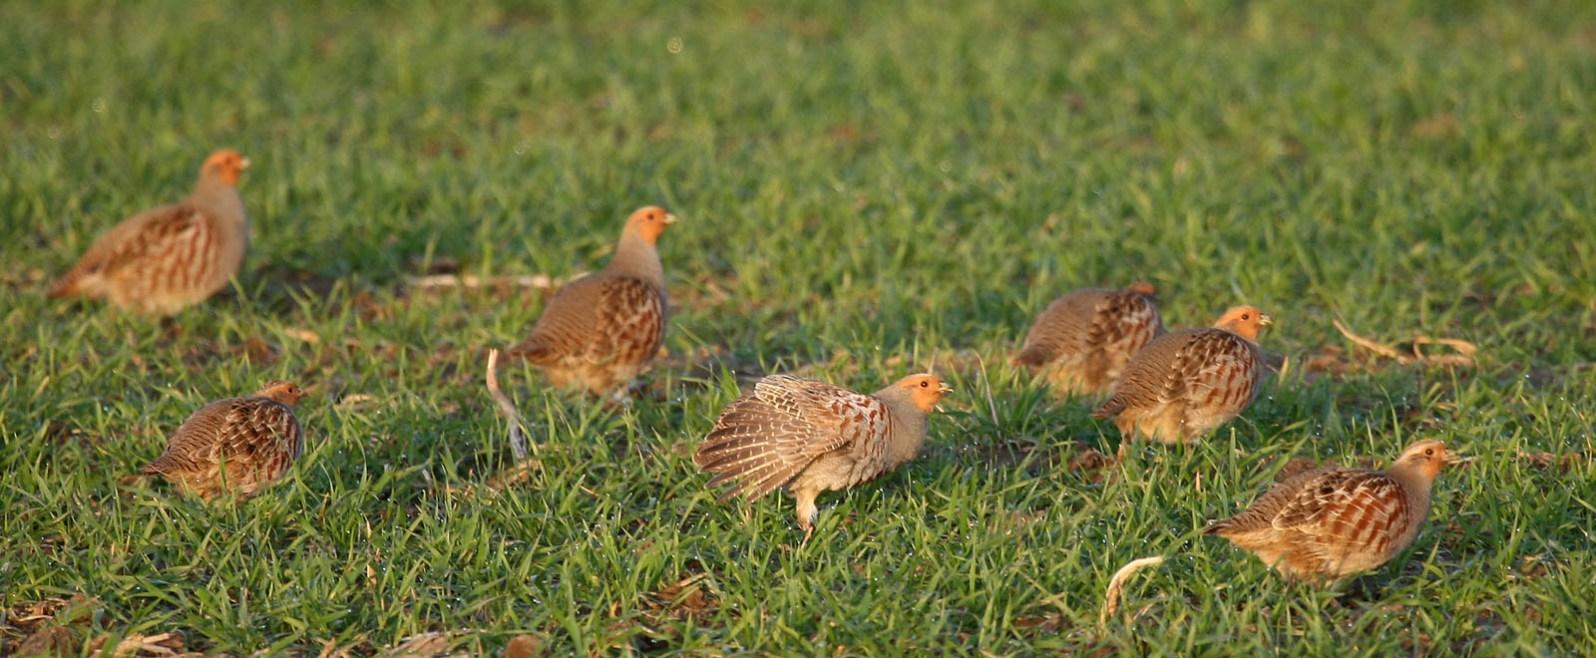 Rebhühner ©A. Brillen/piclease